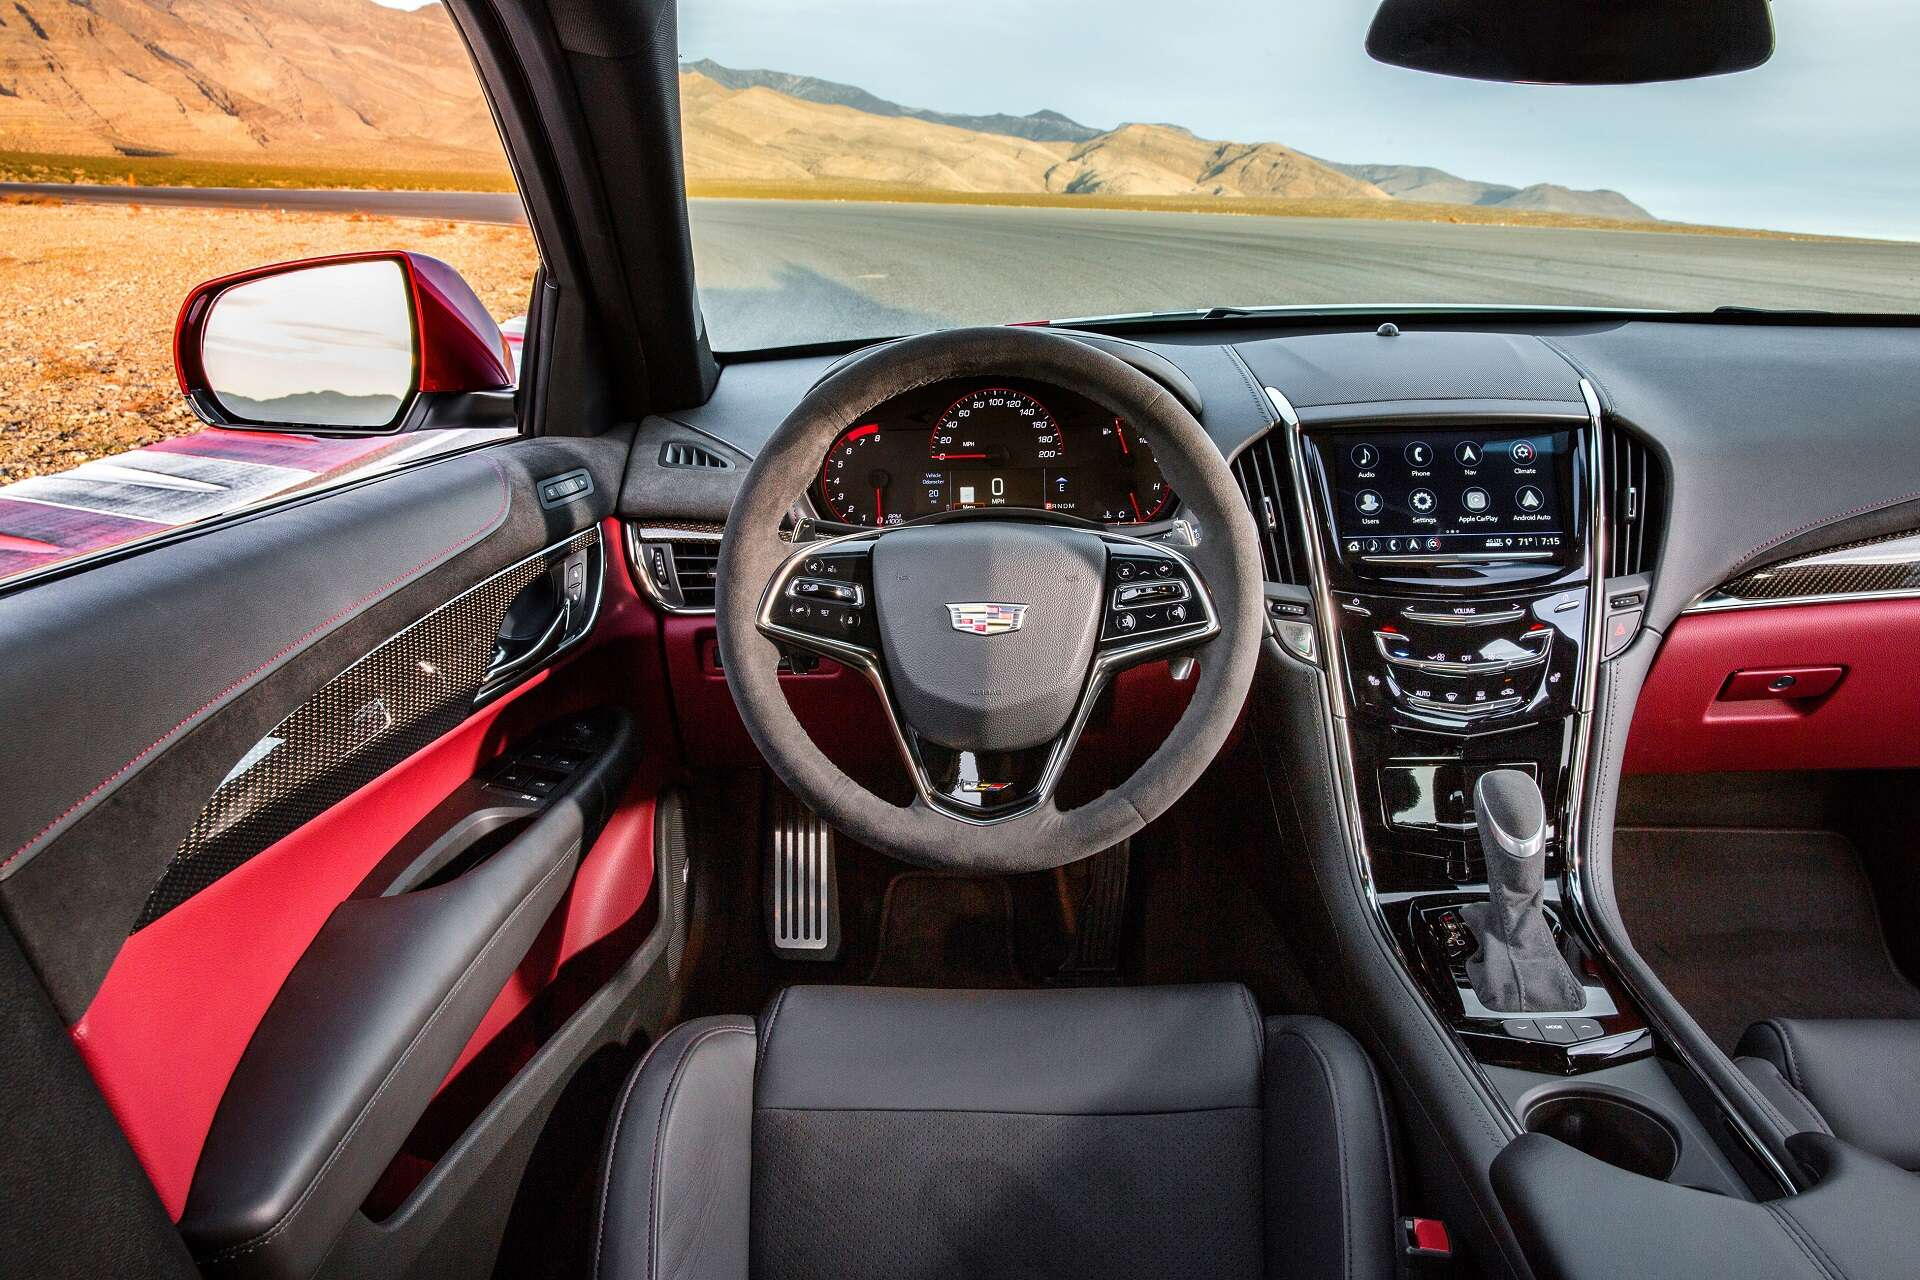 Special Championship Edition Cadillac Cts V And Ats V Coming To